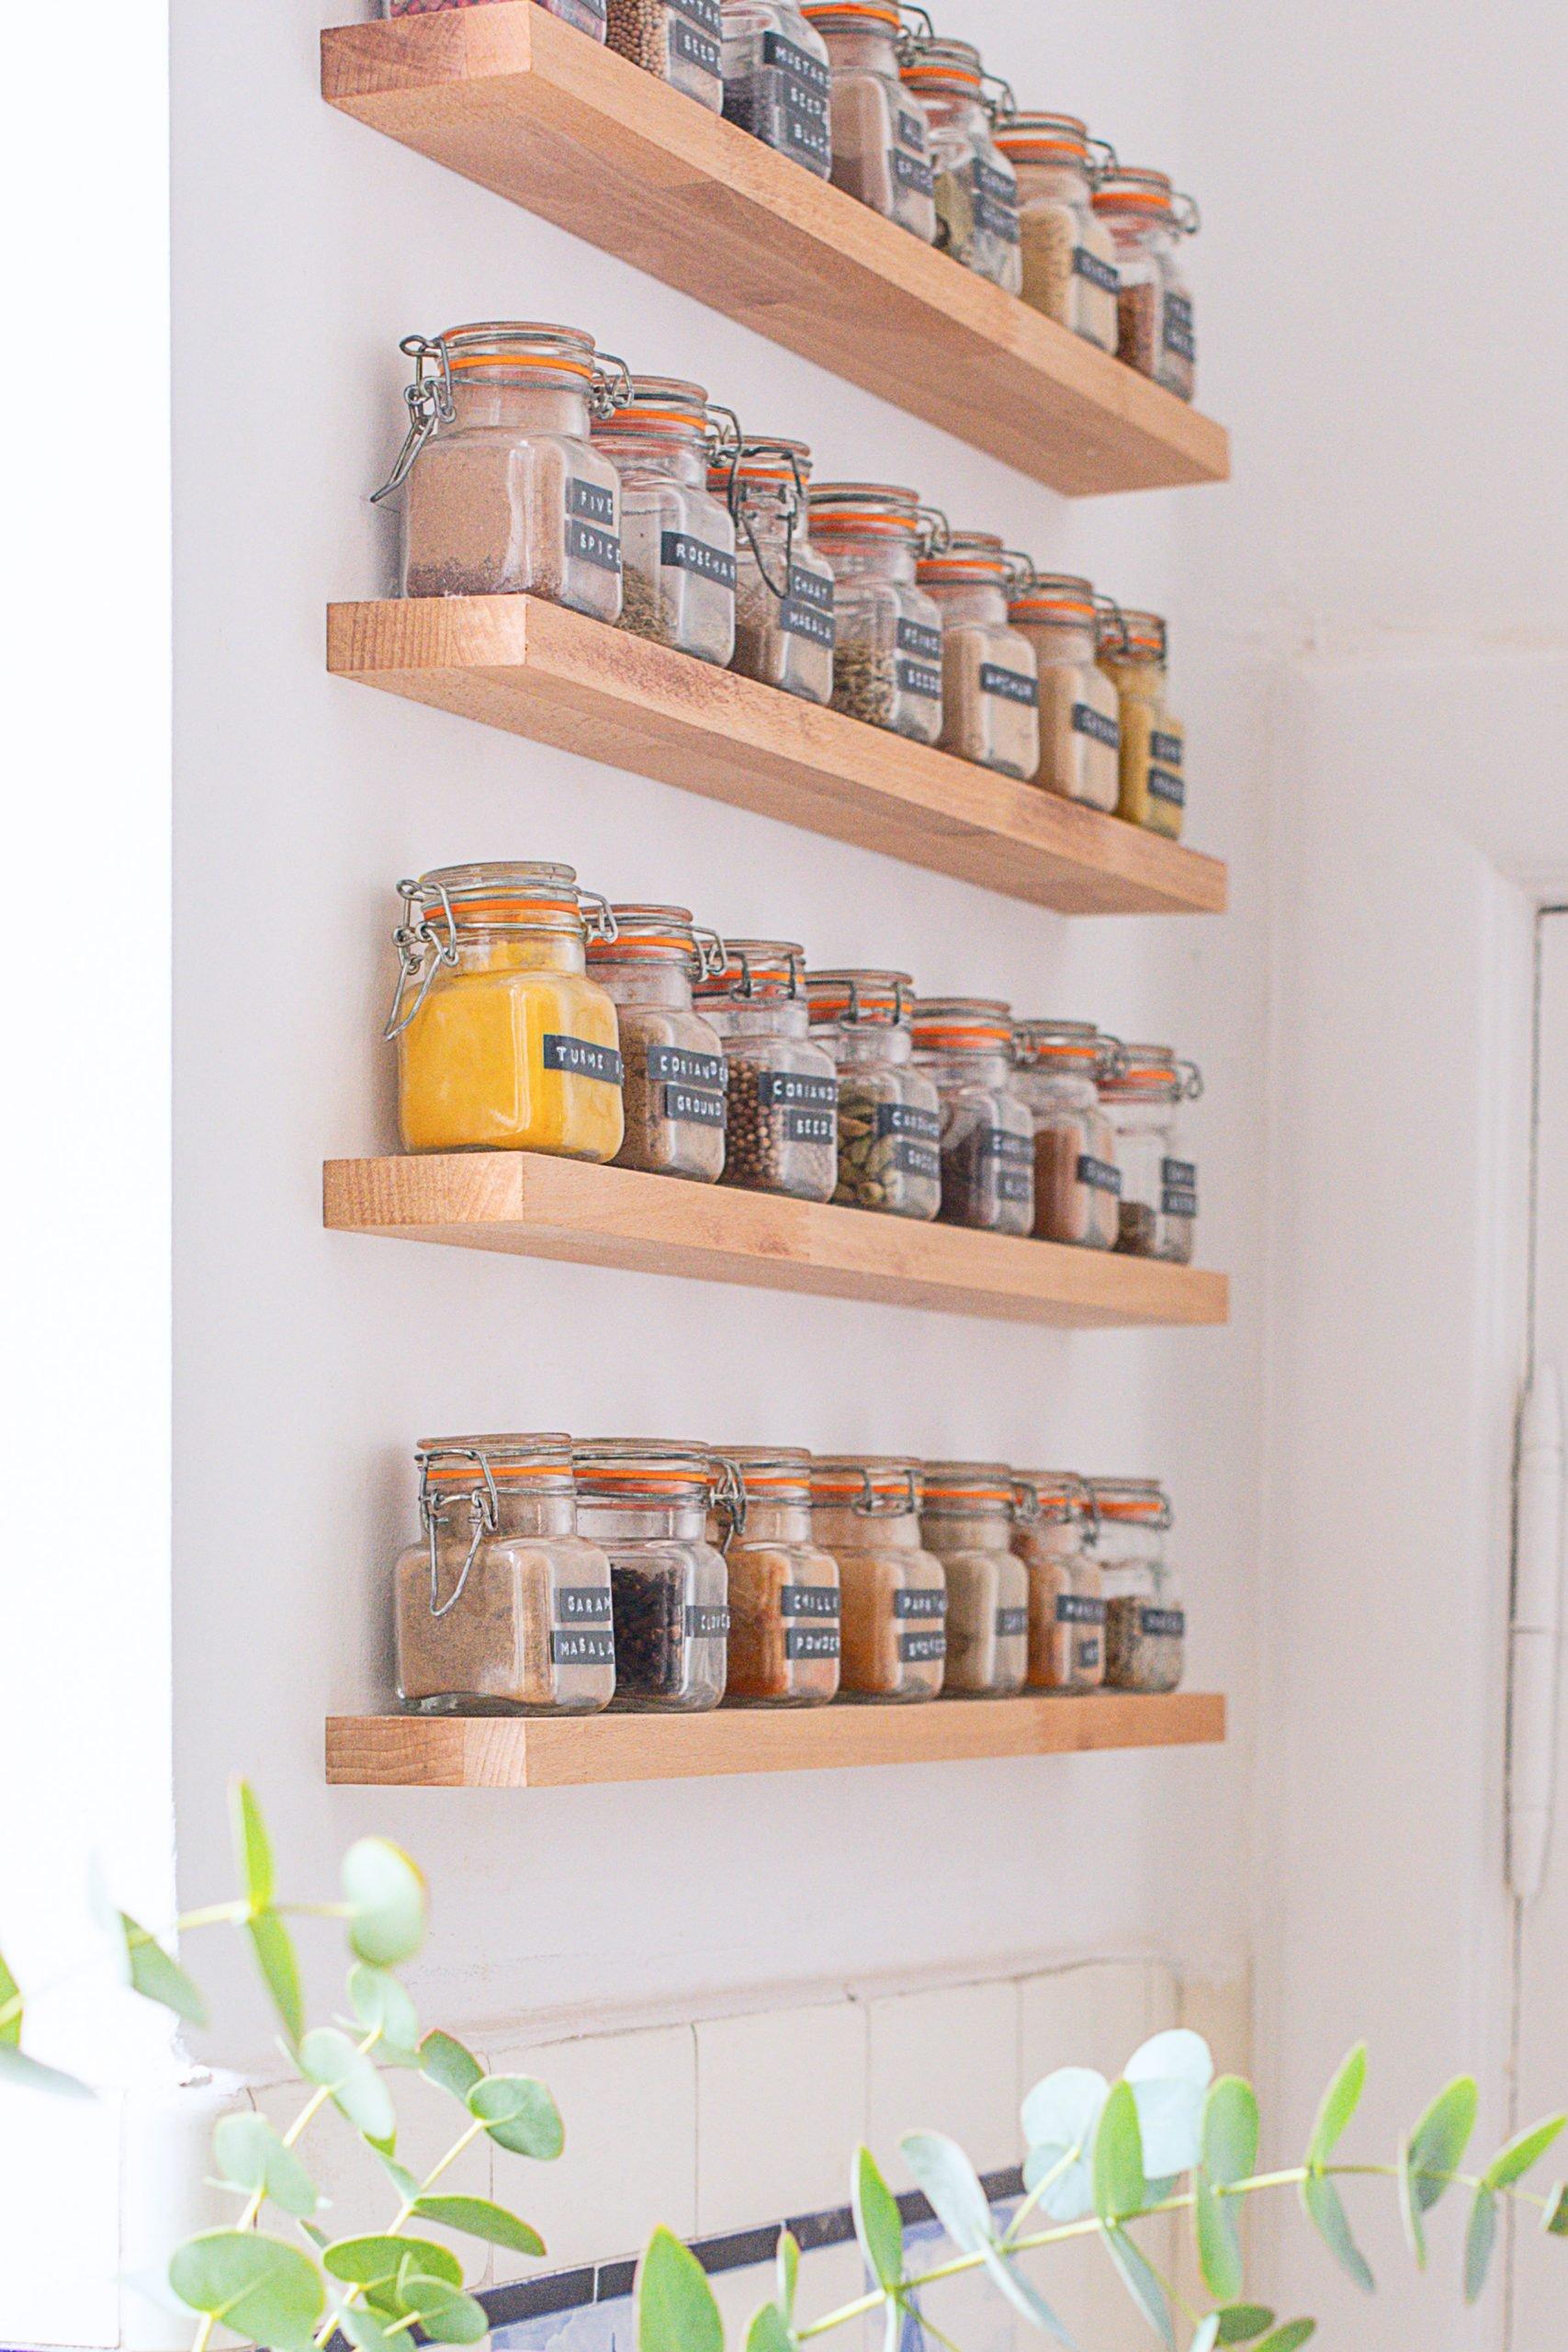 Image of: Diy Floating Spice Rack Little House On The Corner